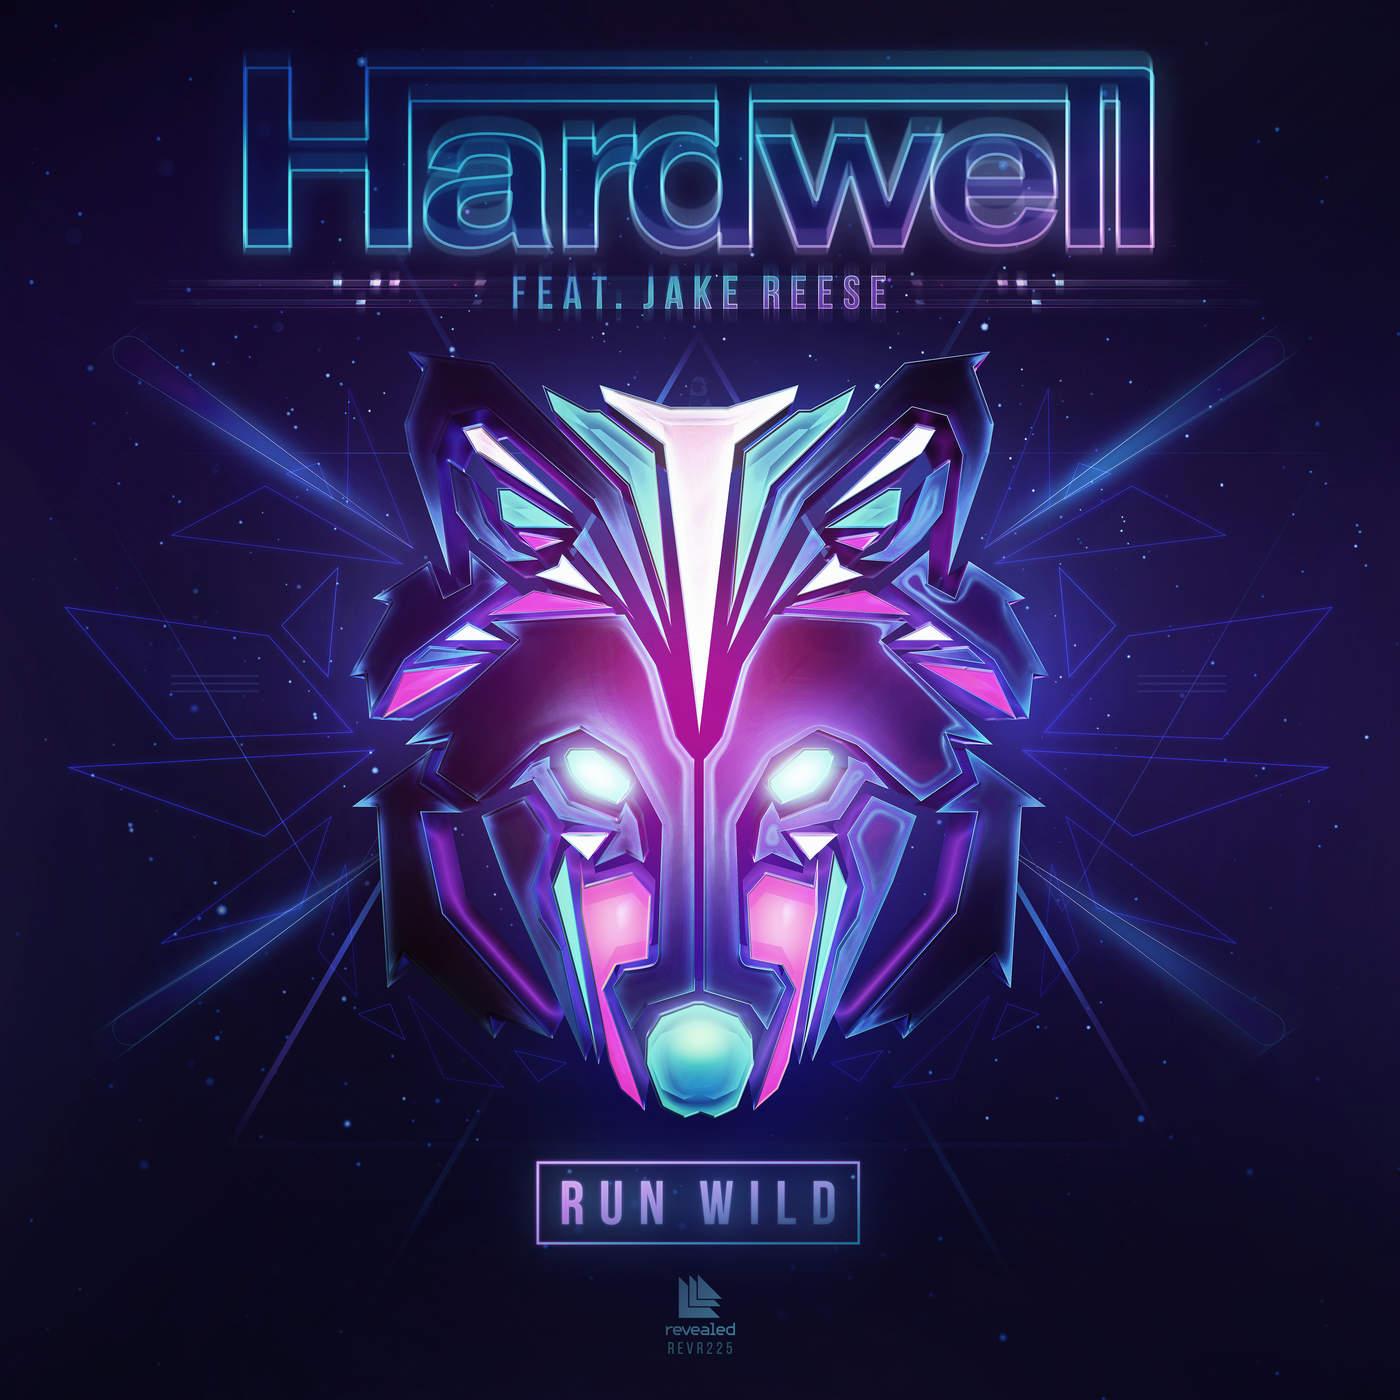 Hardwell - Run Wild (feat. Jake Reese) - Single Cover